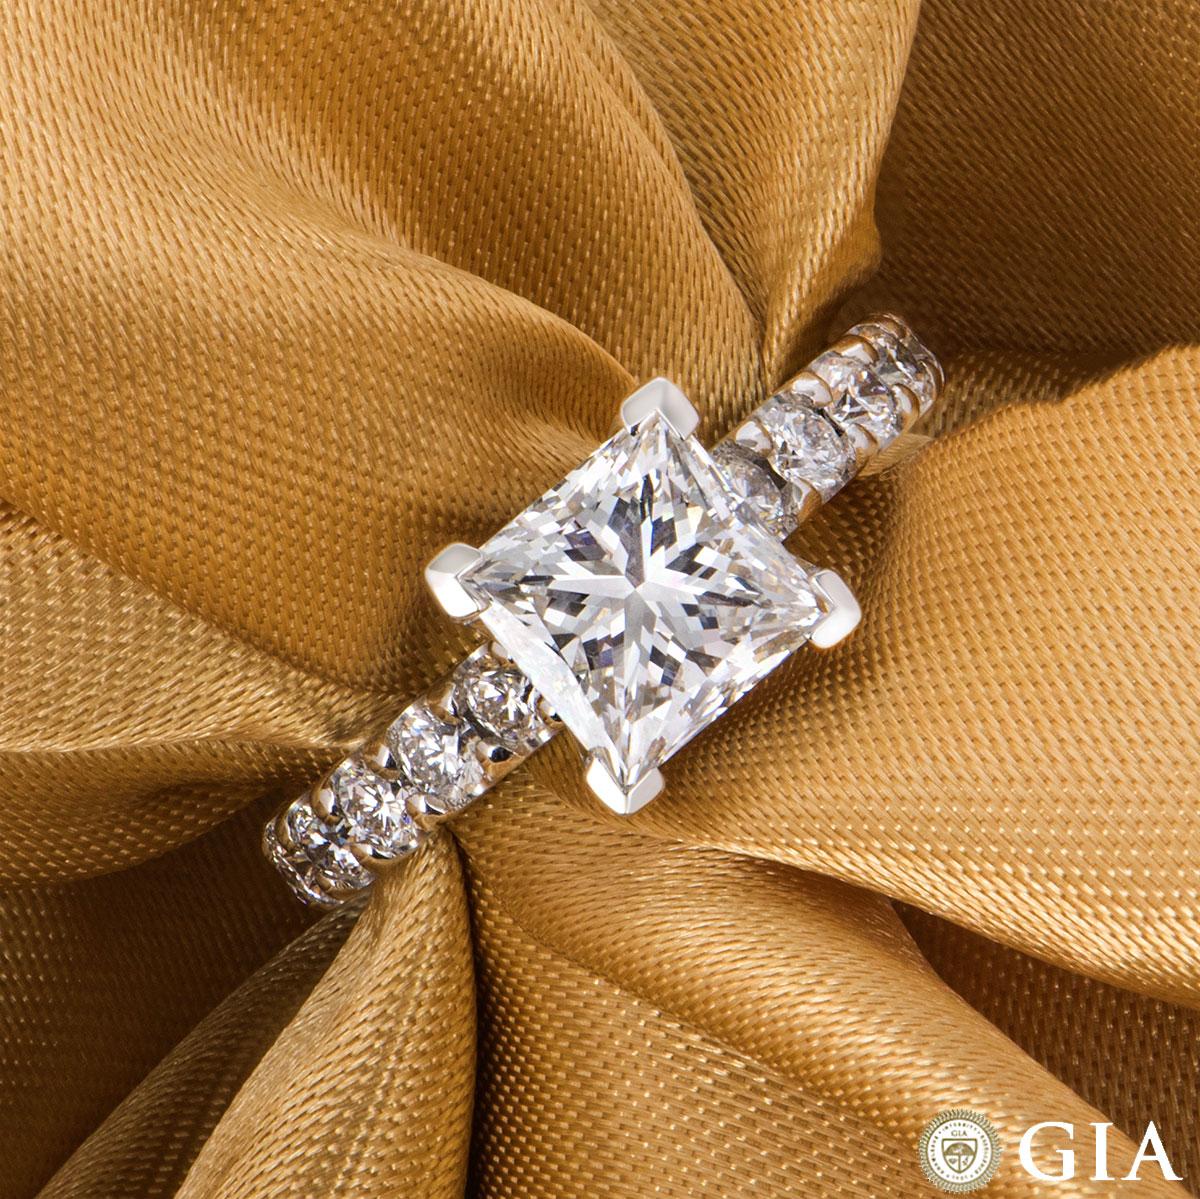 White Gold Princess Cut Diamond Ring 2.01ct F/VVS1